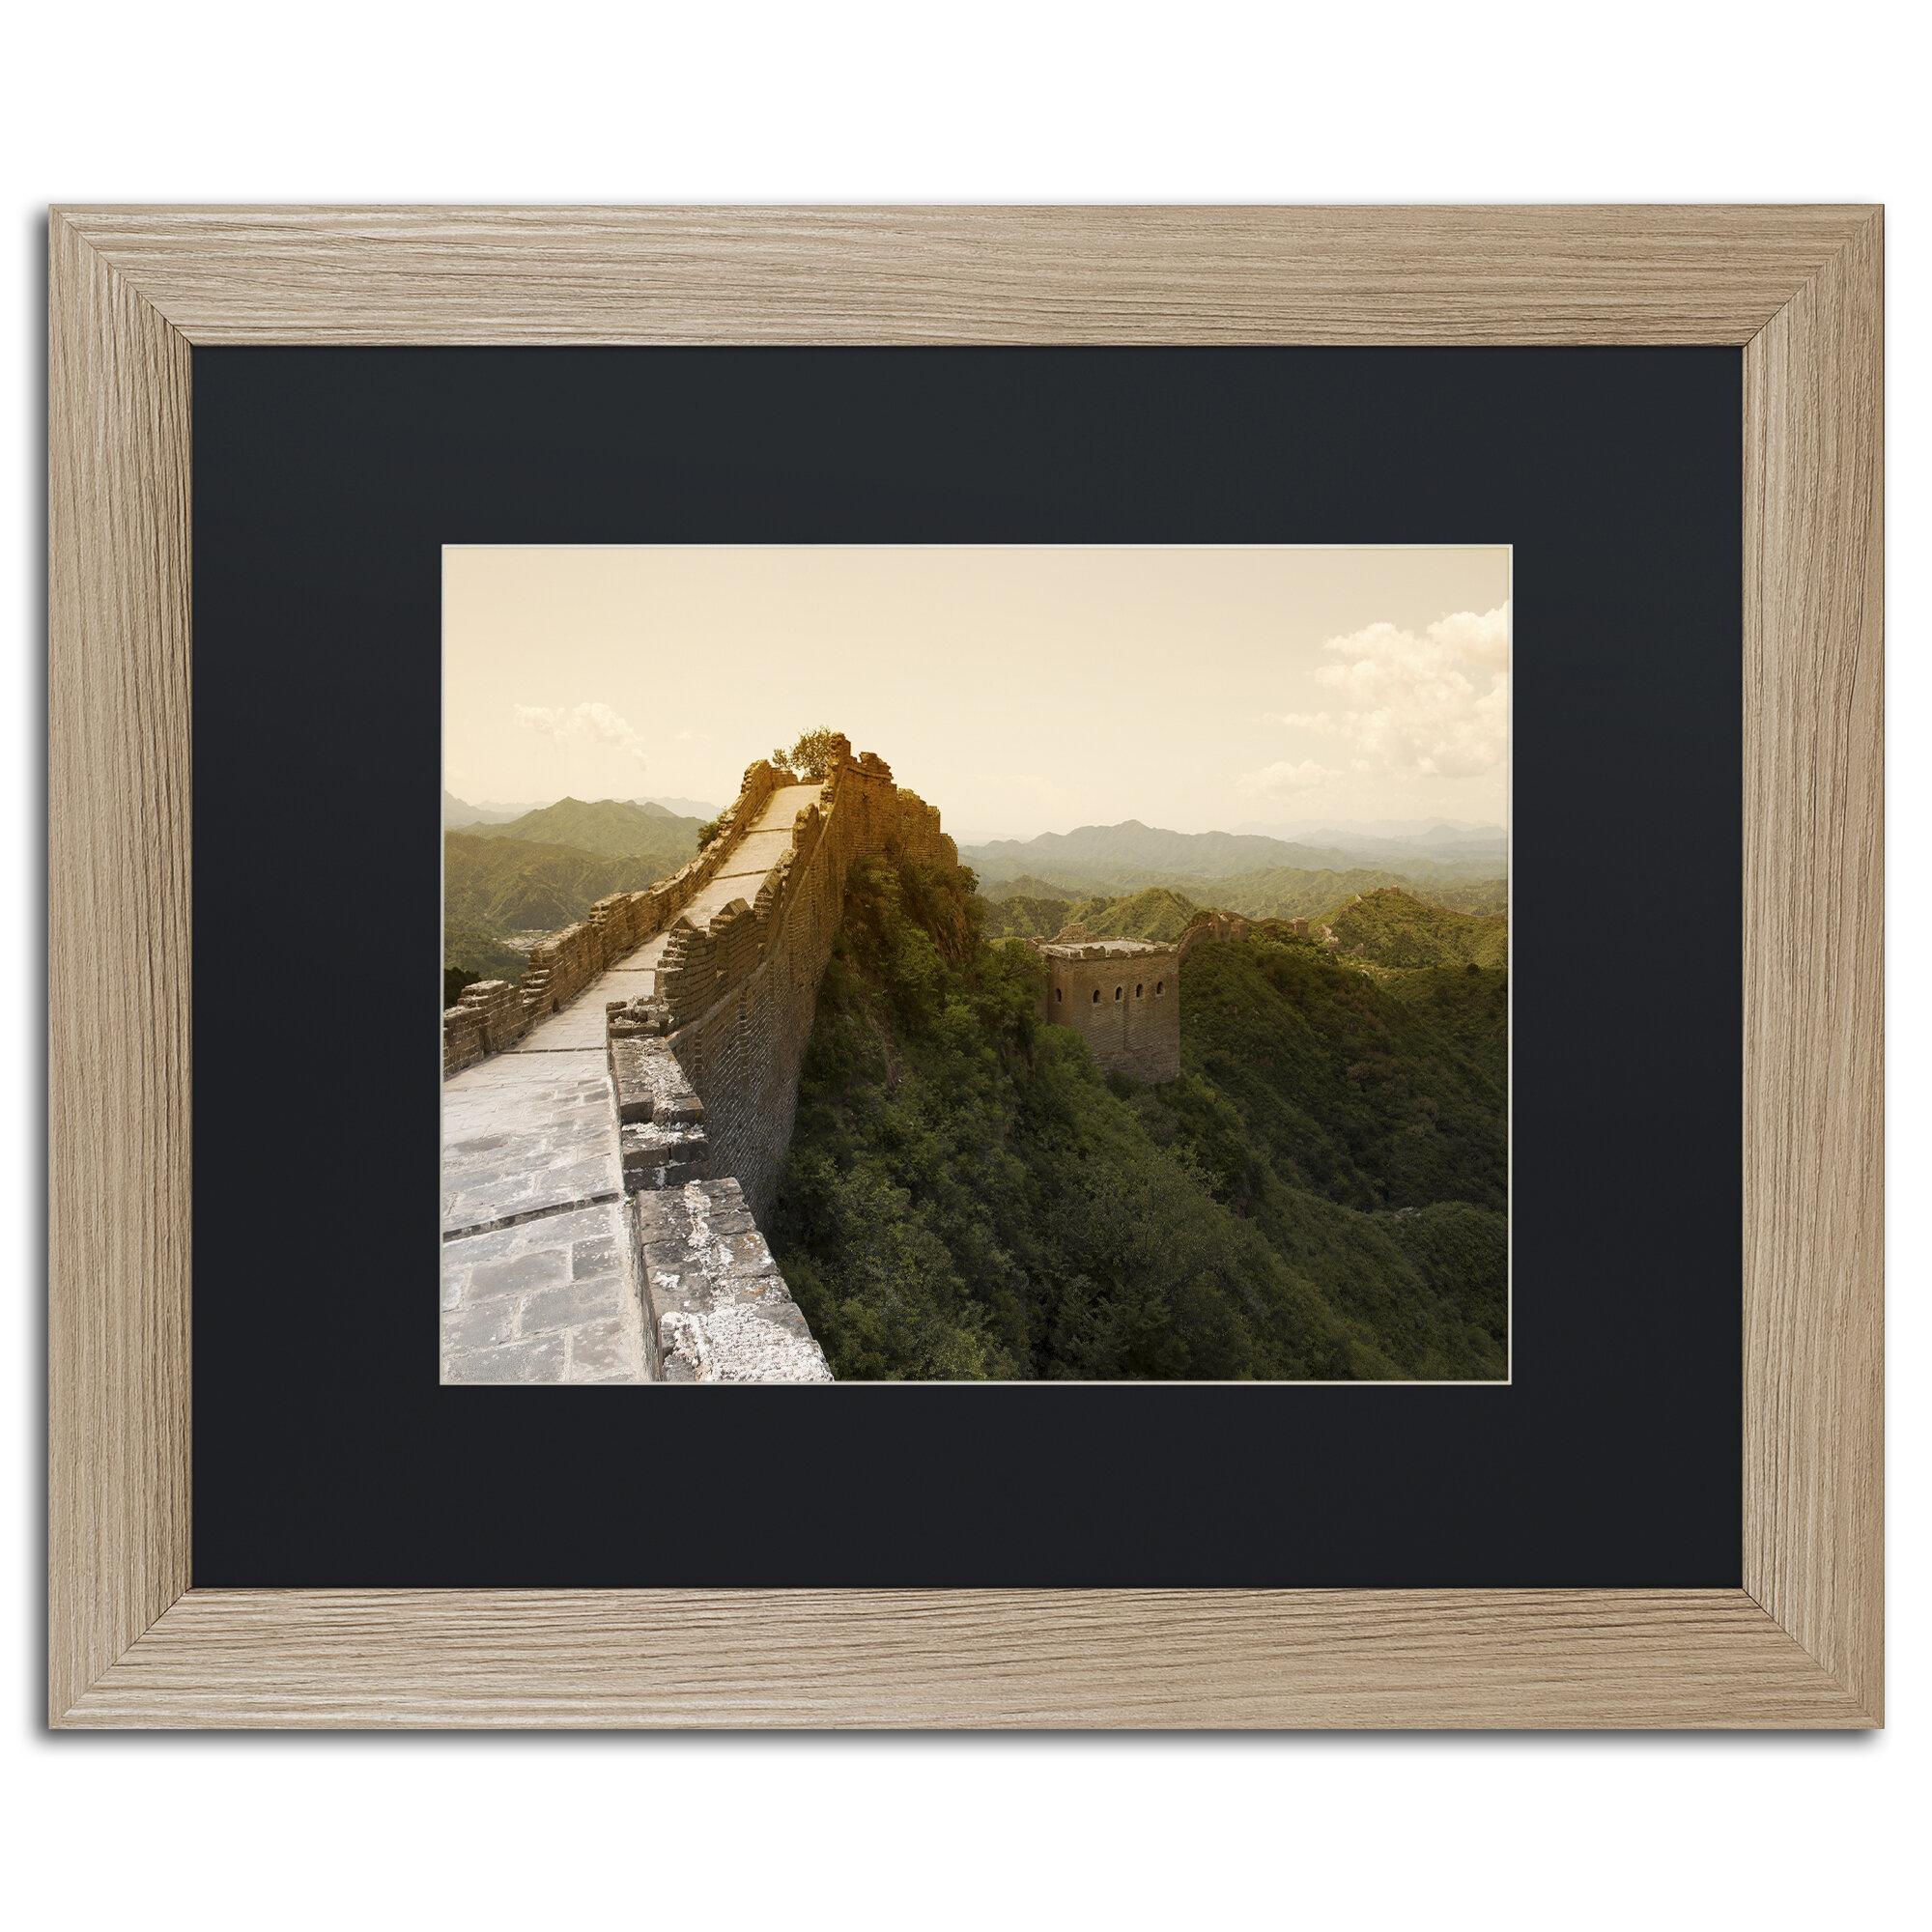 Trademark Art Great Wall X By Philippe Hugonnard Framed Photographic Print Wayfair